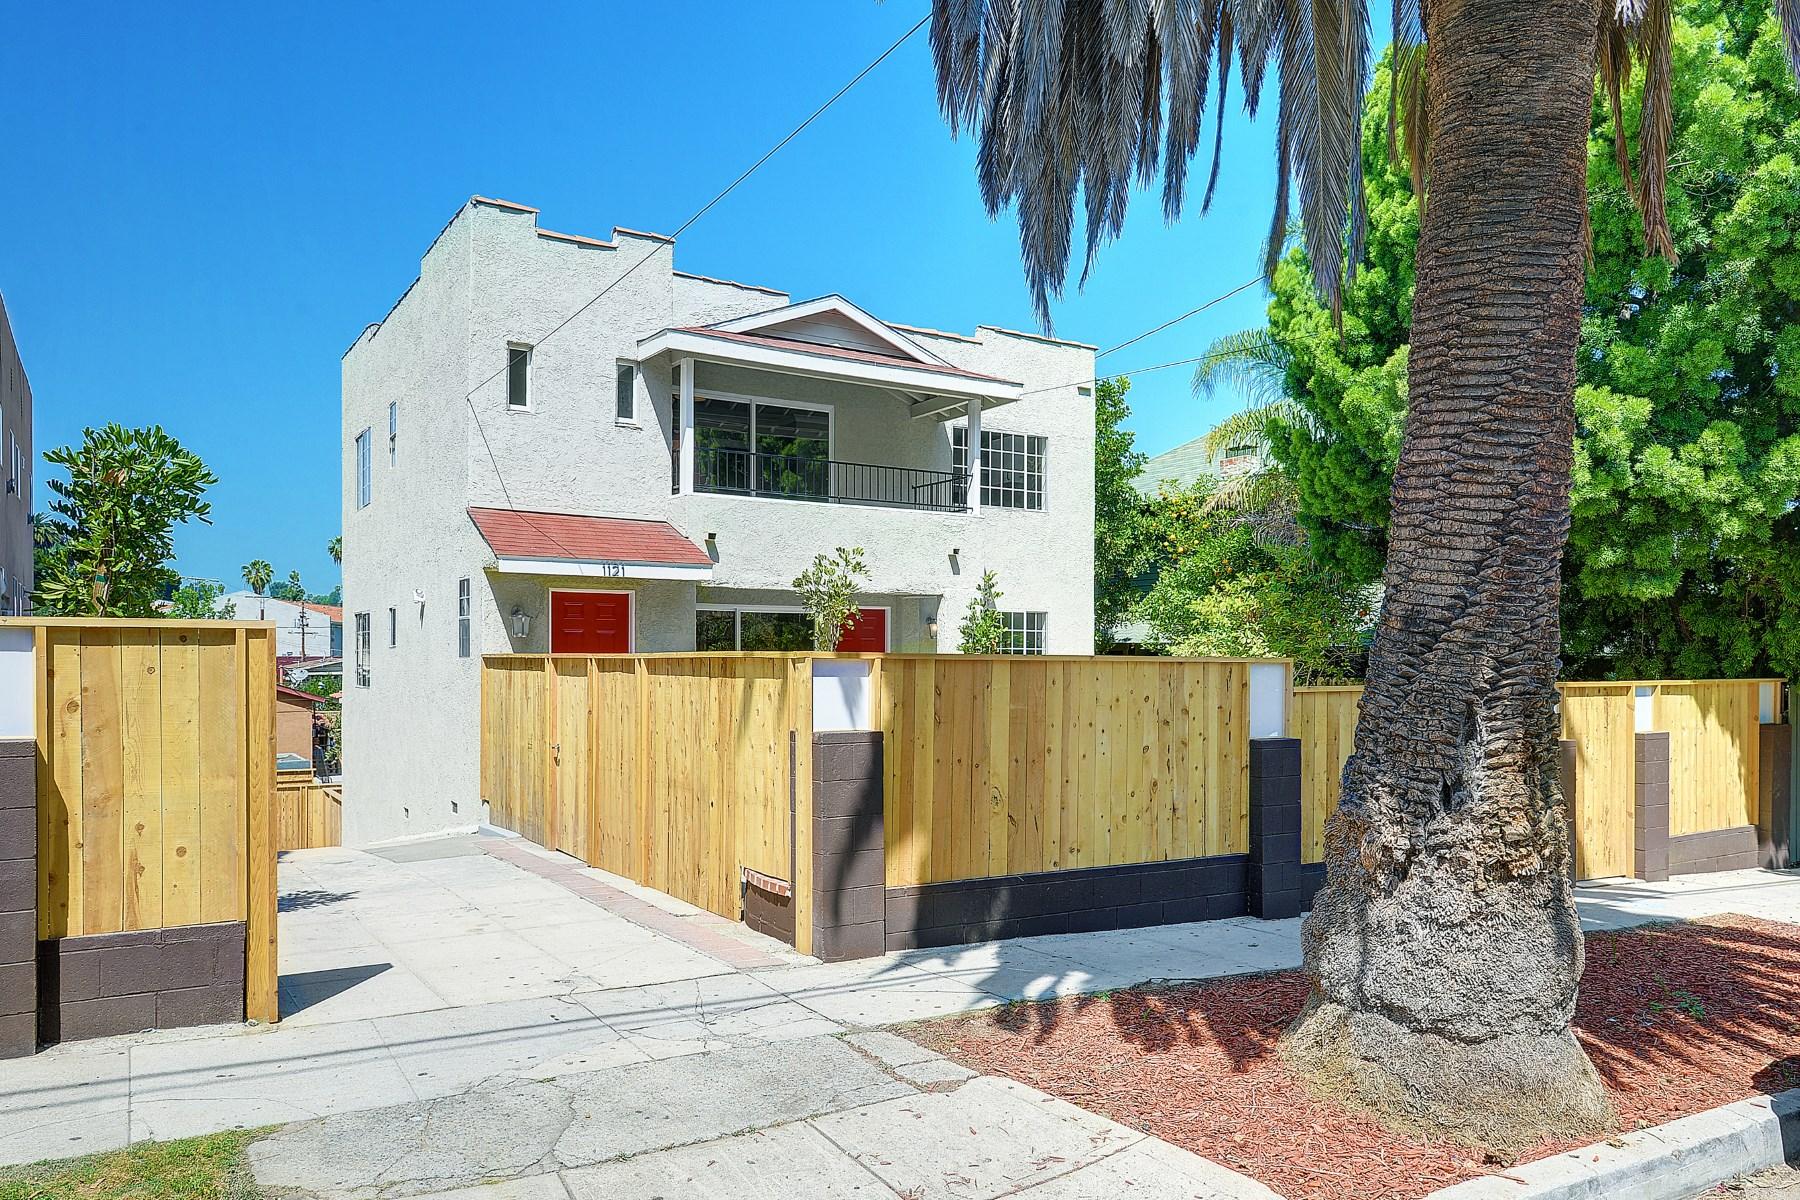 Moradia Multi-familiar para Venda às 1121 Coronado Street Silver Lake, Los Angeles, Califórnia 90026 Estados Unidos